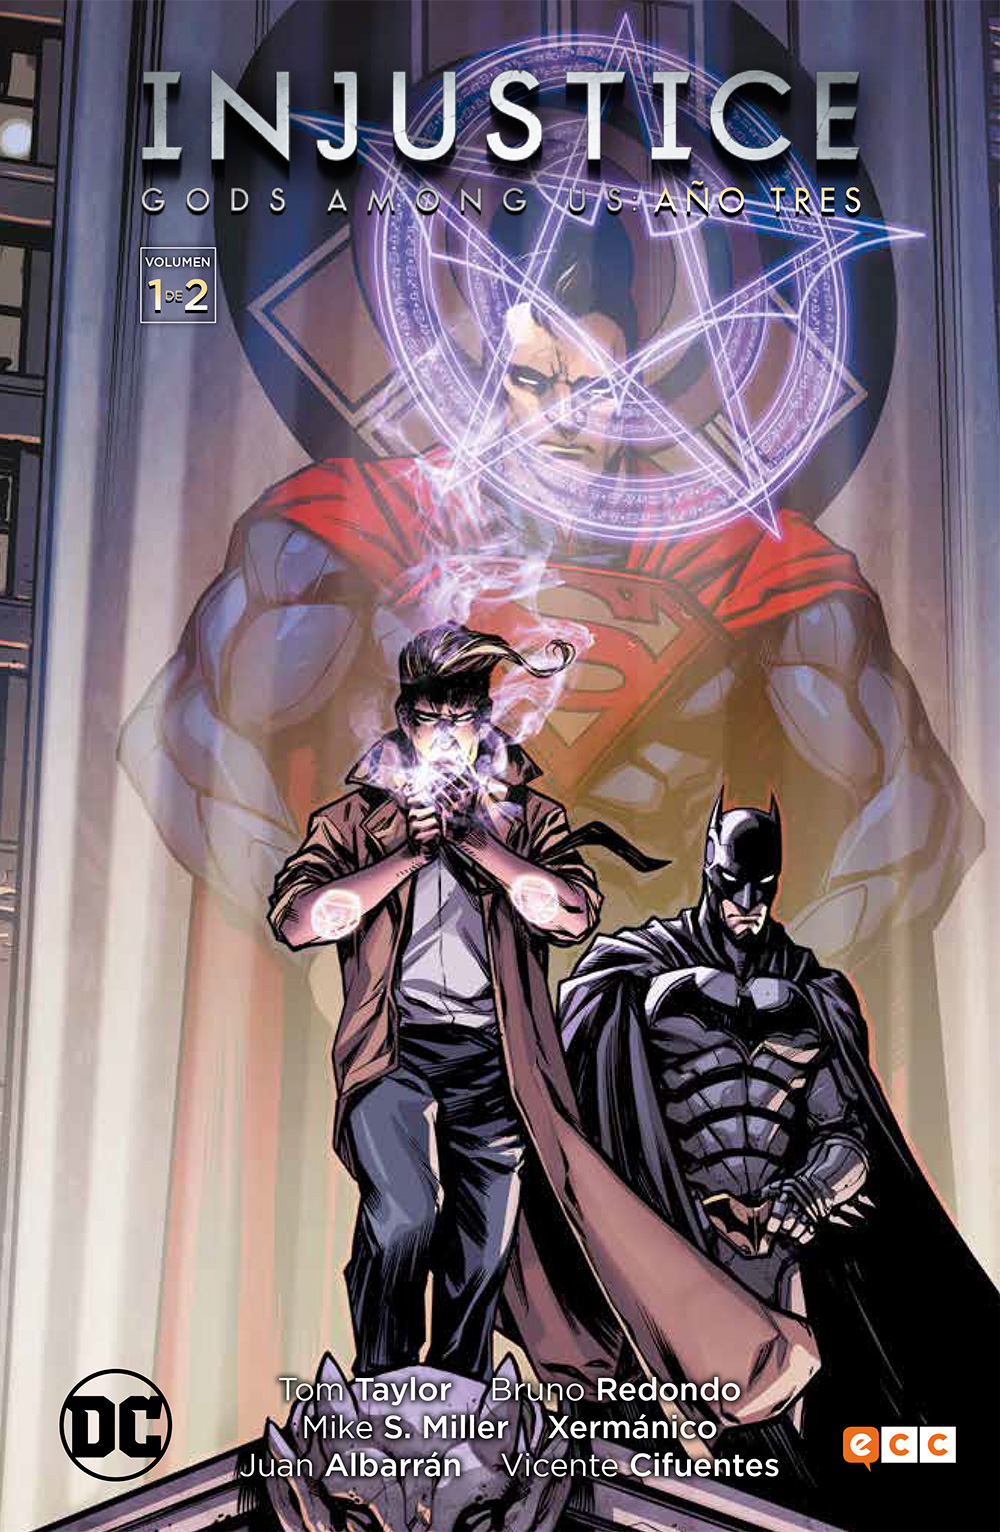 Leer Injustice año 3 Comic Online en Español